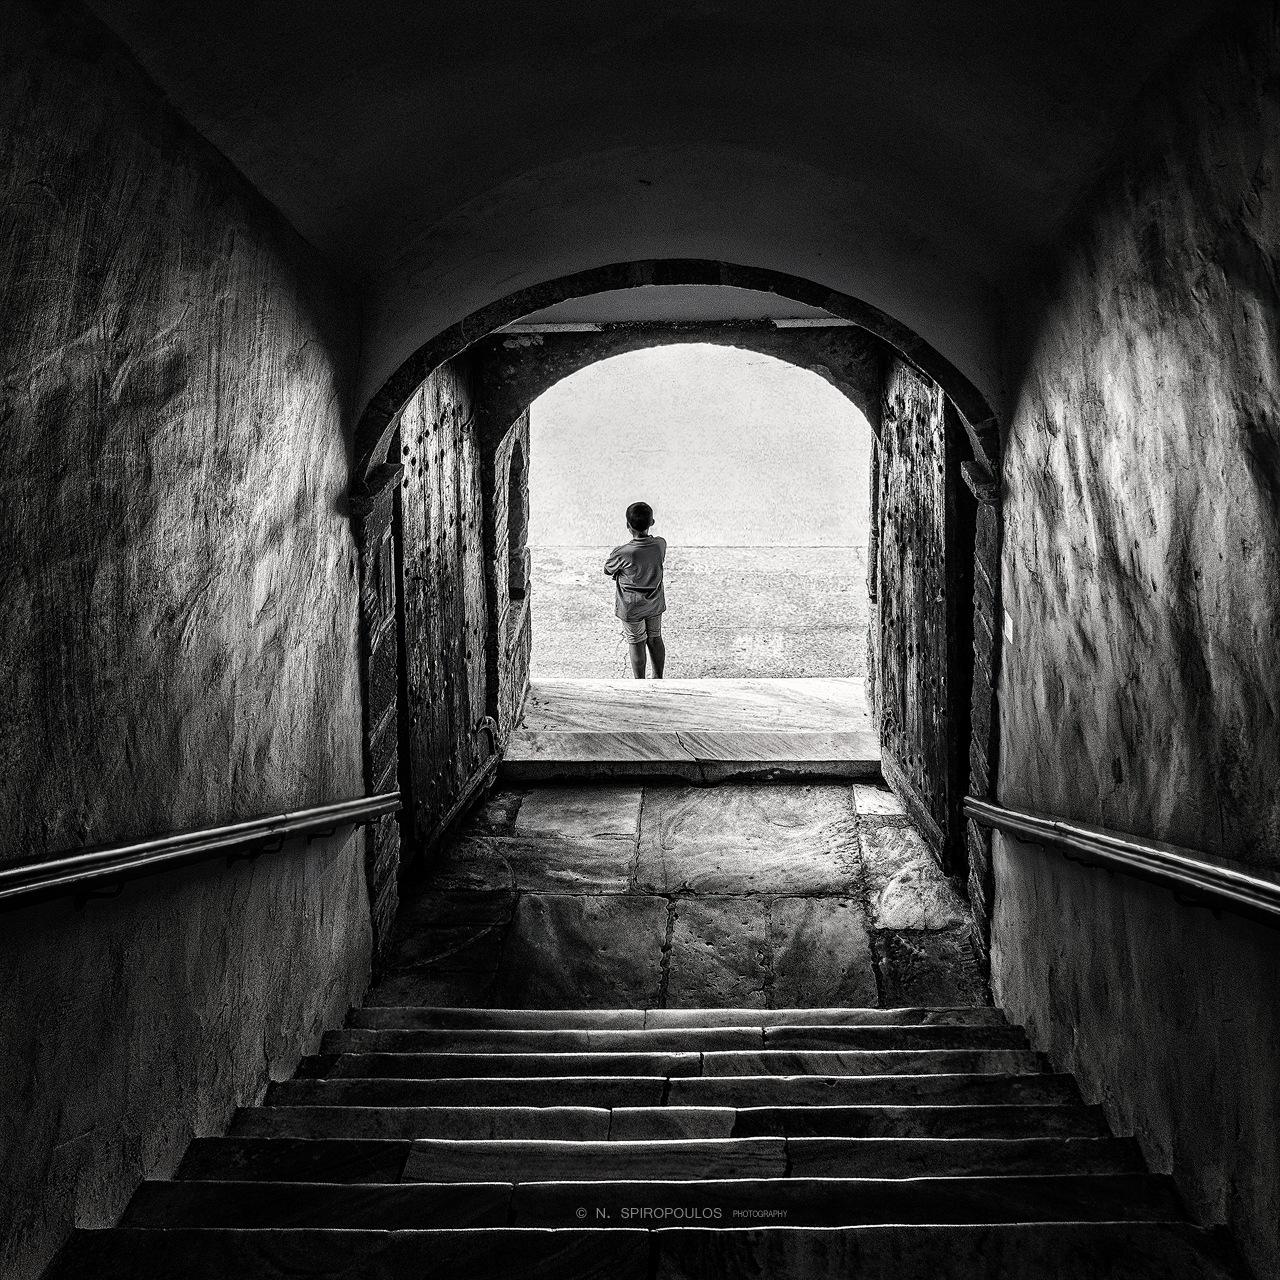 Stairs by Nikolas Spiropoulos